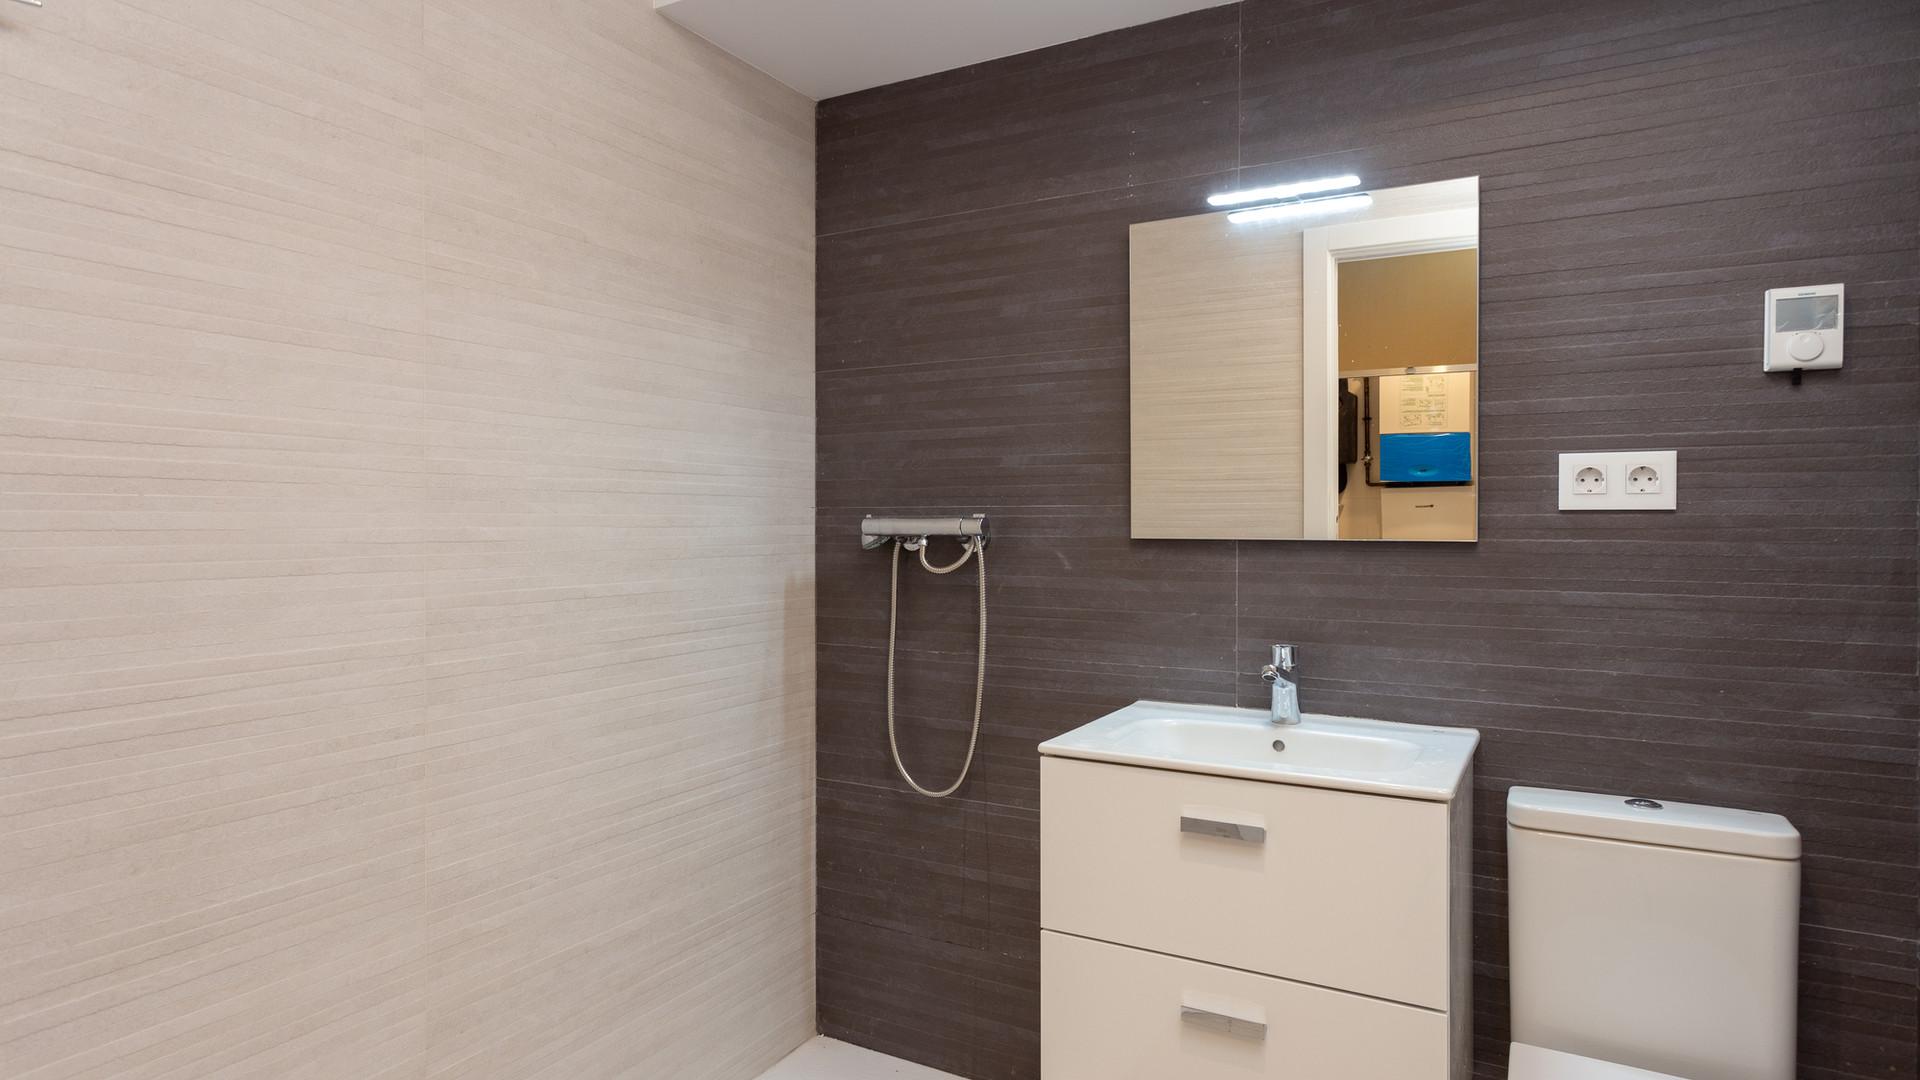 Санузел 1 этаж / Bathroom fl 1